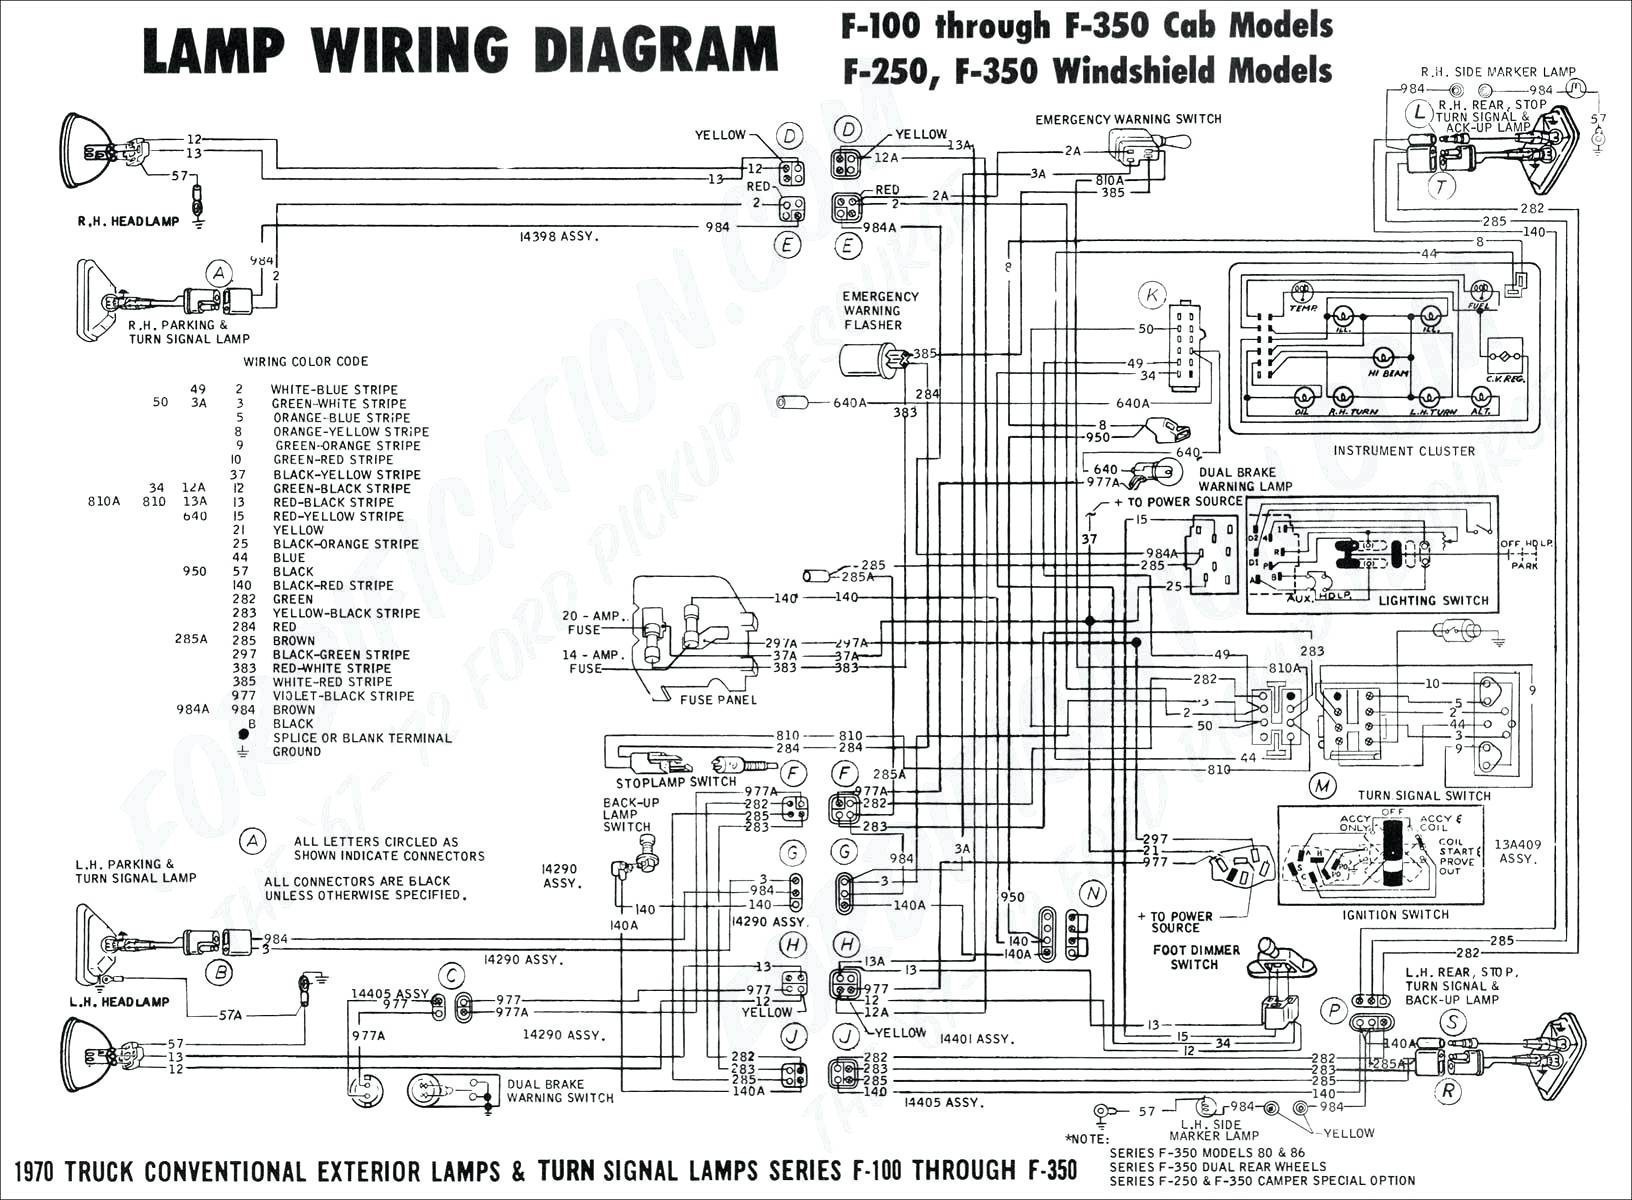 2007 Hyundai Santa Fe Engine Diagram Sensor Wiring Diagram 2008 F250 Worksheet and Wiring Diagram • Of 2007 Hyundai Santa Fe Engine Diagram